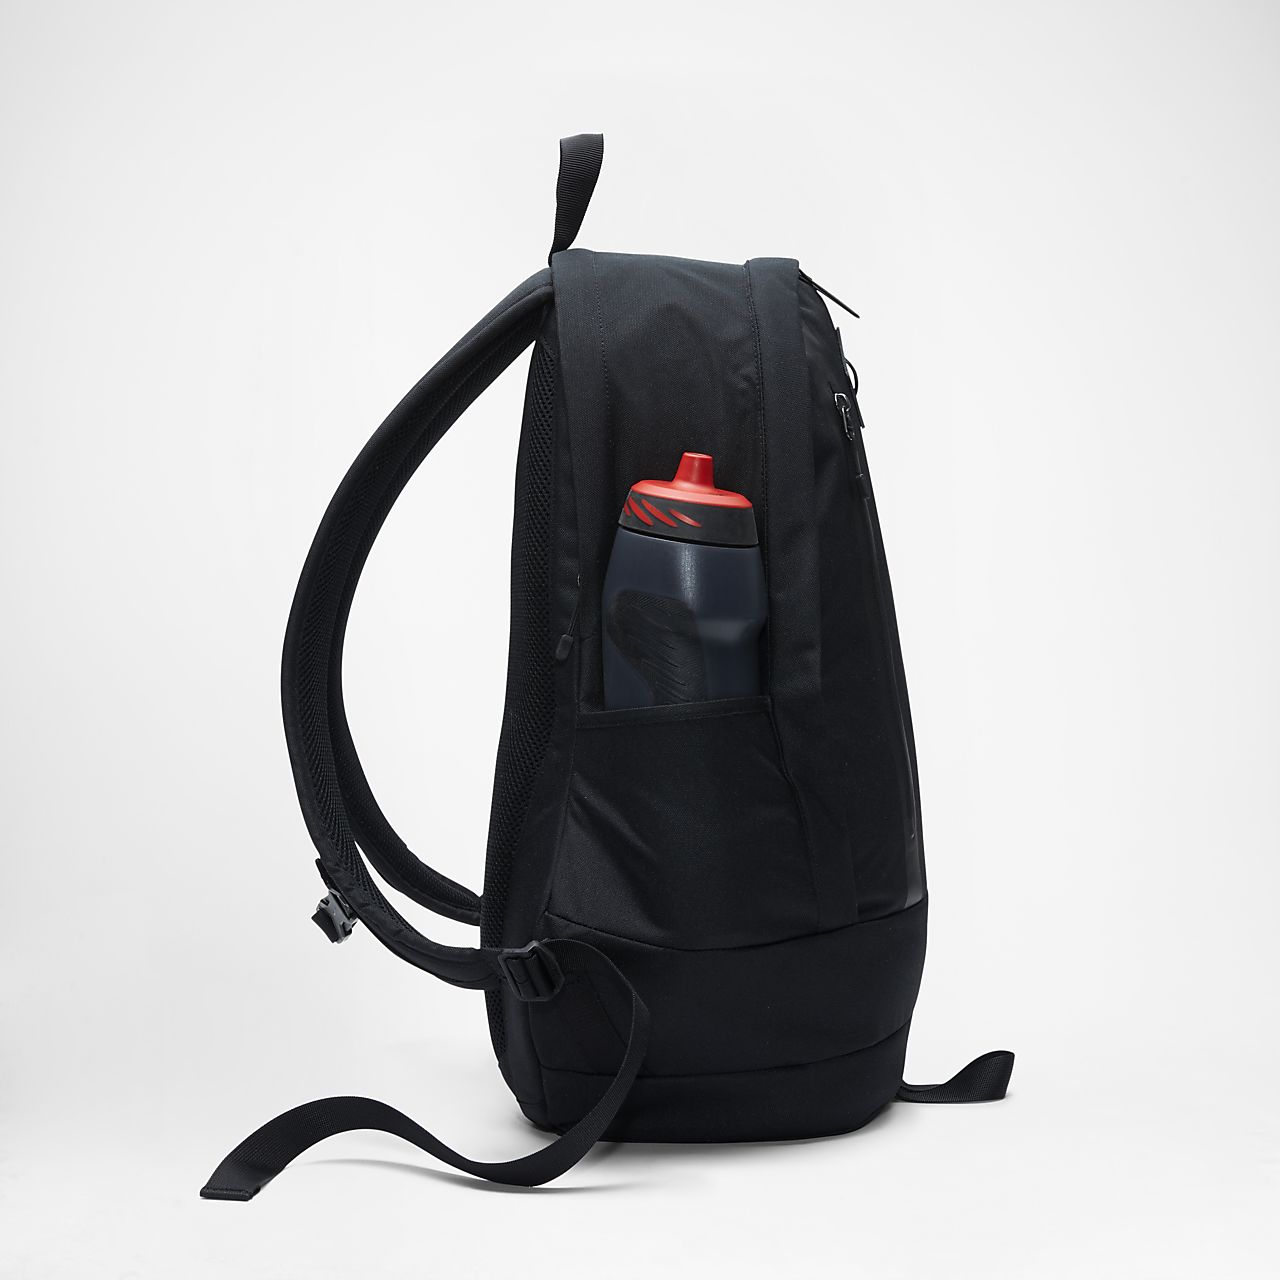 5ead39a11f8c Nike Sportswear Cheyenne 3.0 Solid Backpack. Nike.com GB